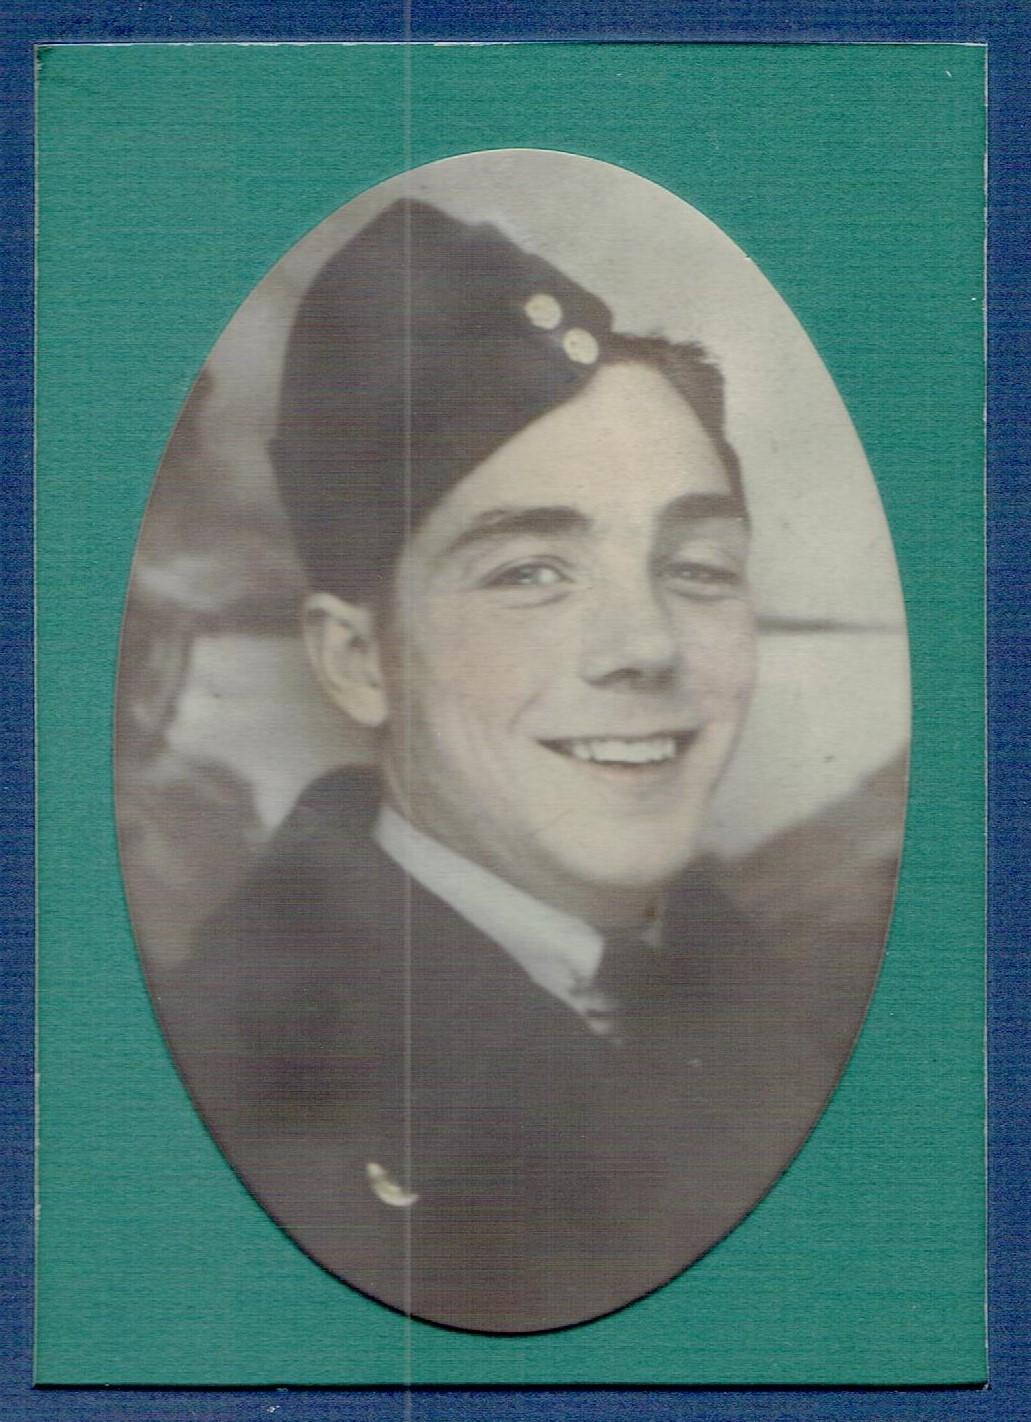 Photo of Walter Alexander Hill– Walter Alexander Hill - 1938 - Royal Canadian Air Force